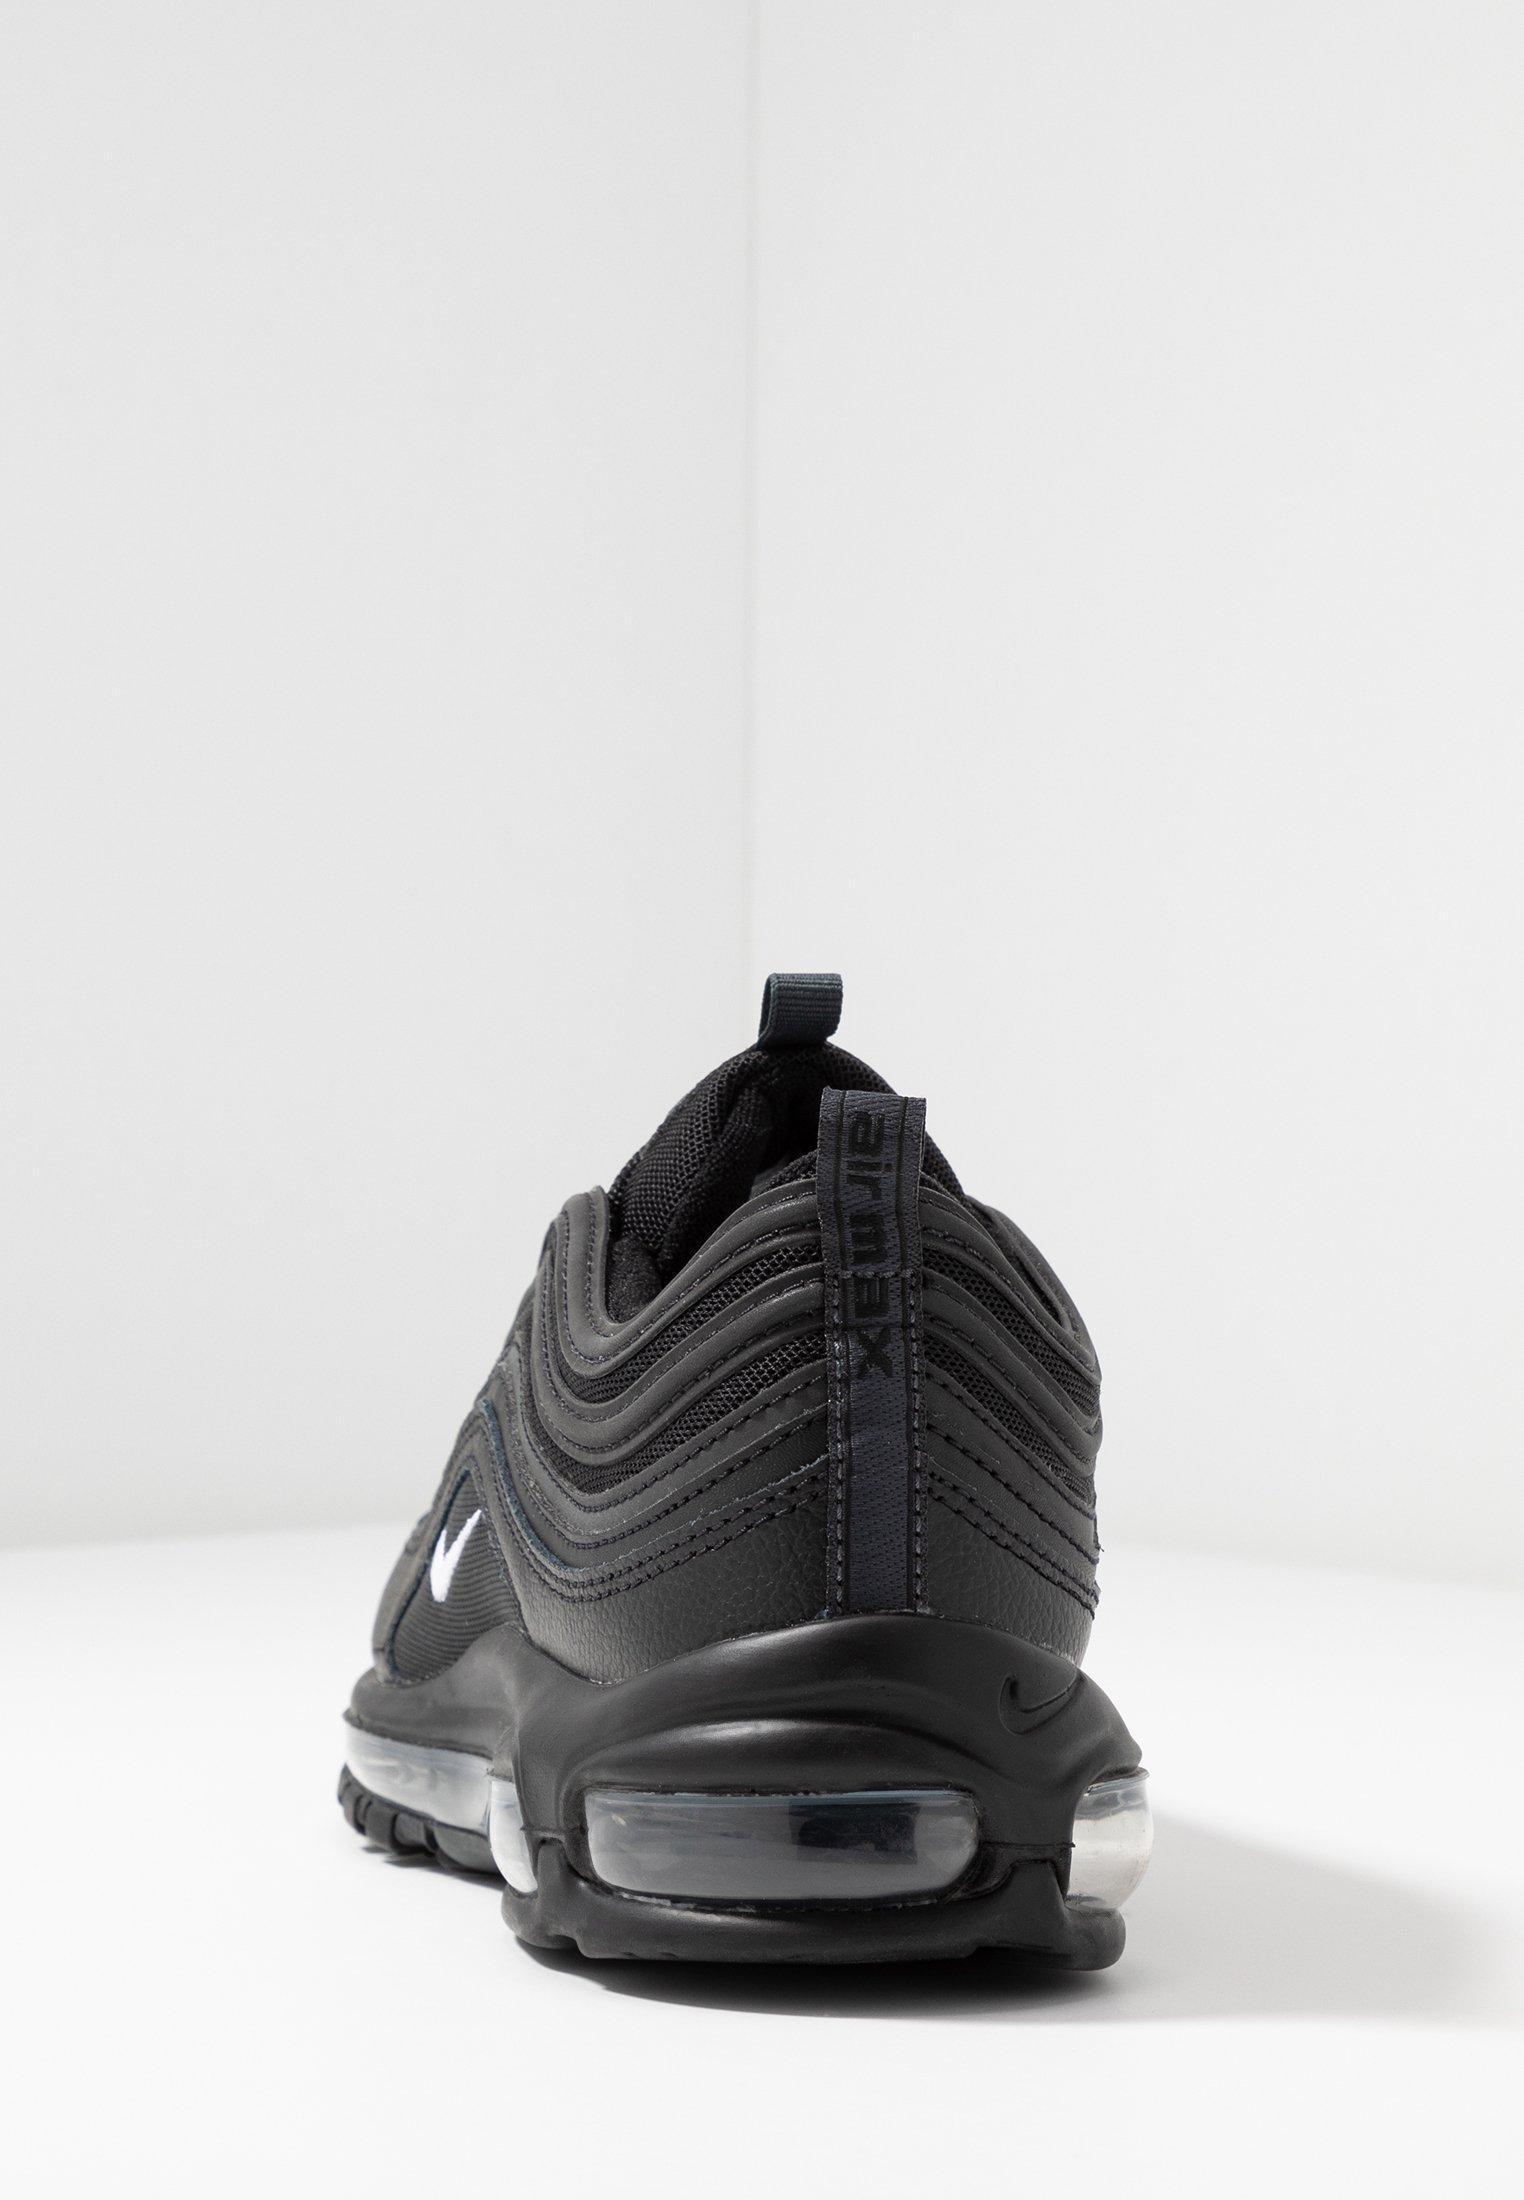 Nike Sportswear Air Max 97 - Sneakers Black/white/anthracite